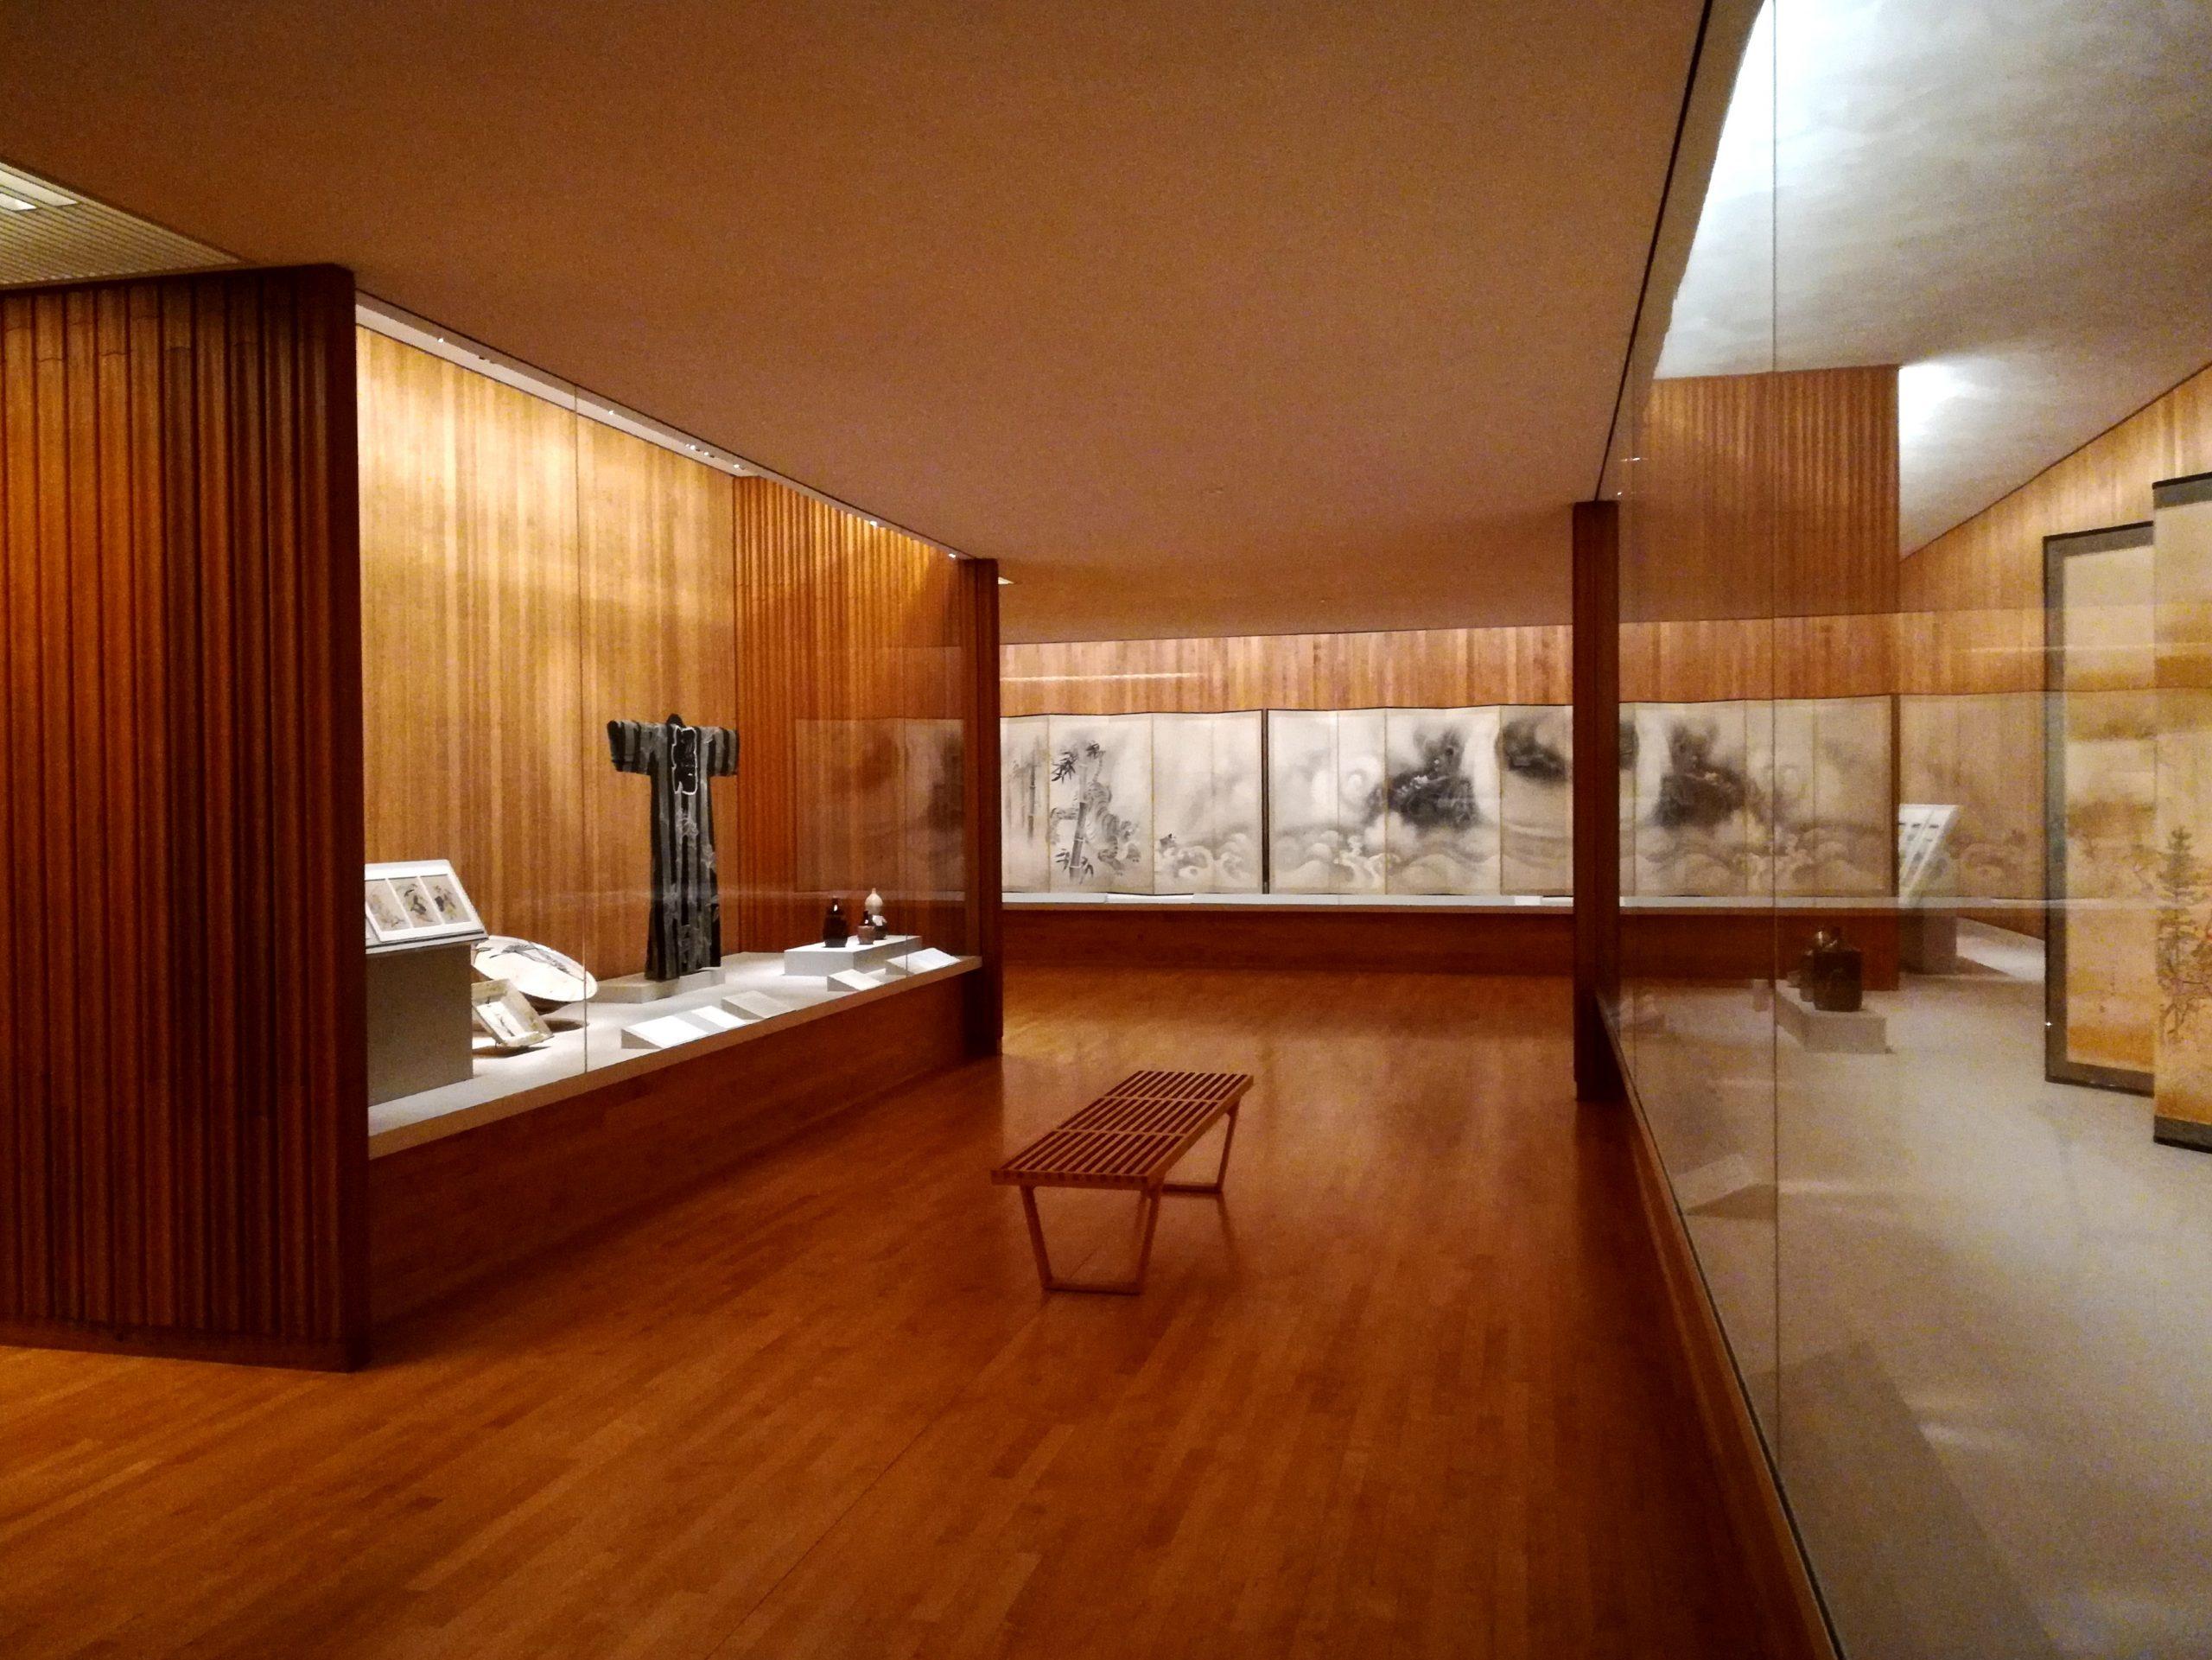 Japan Nelson-Atkins Museum of Art Kansas City KCMO